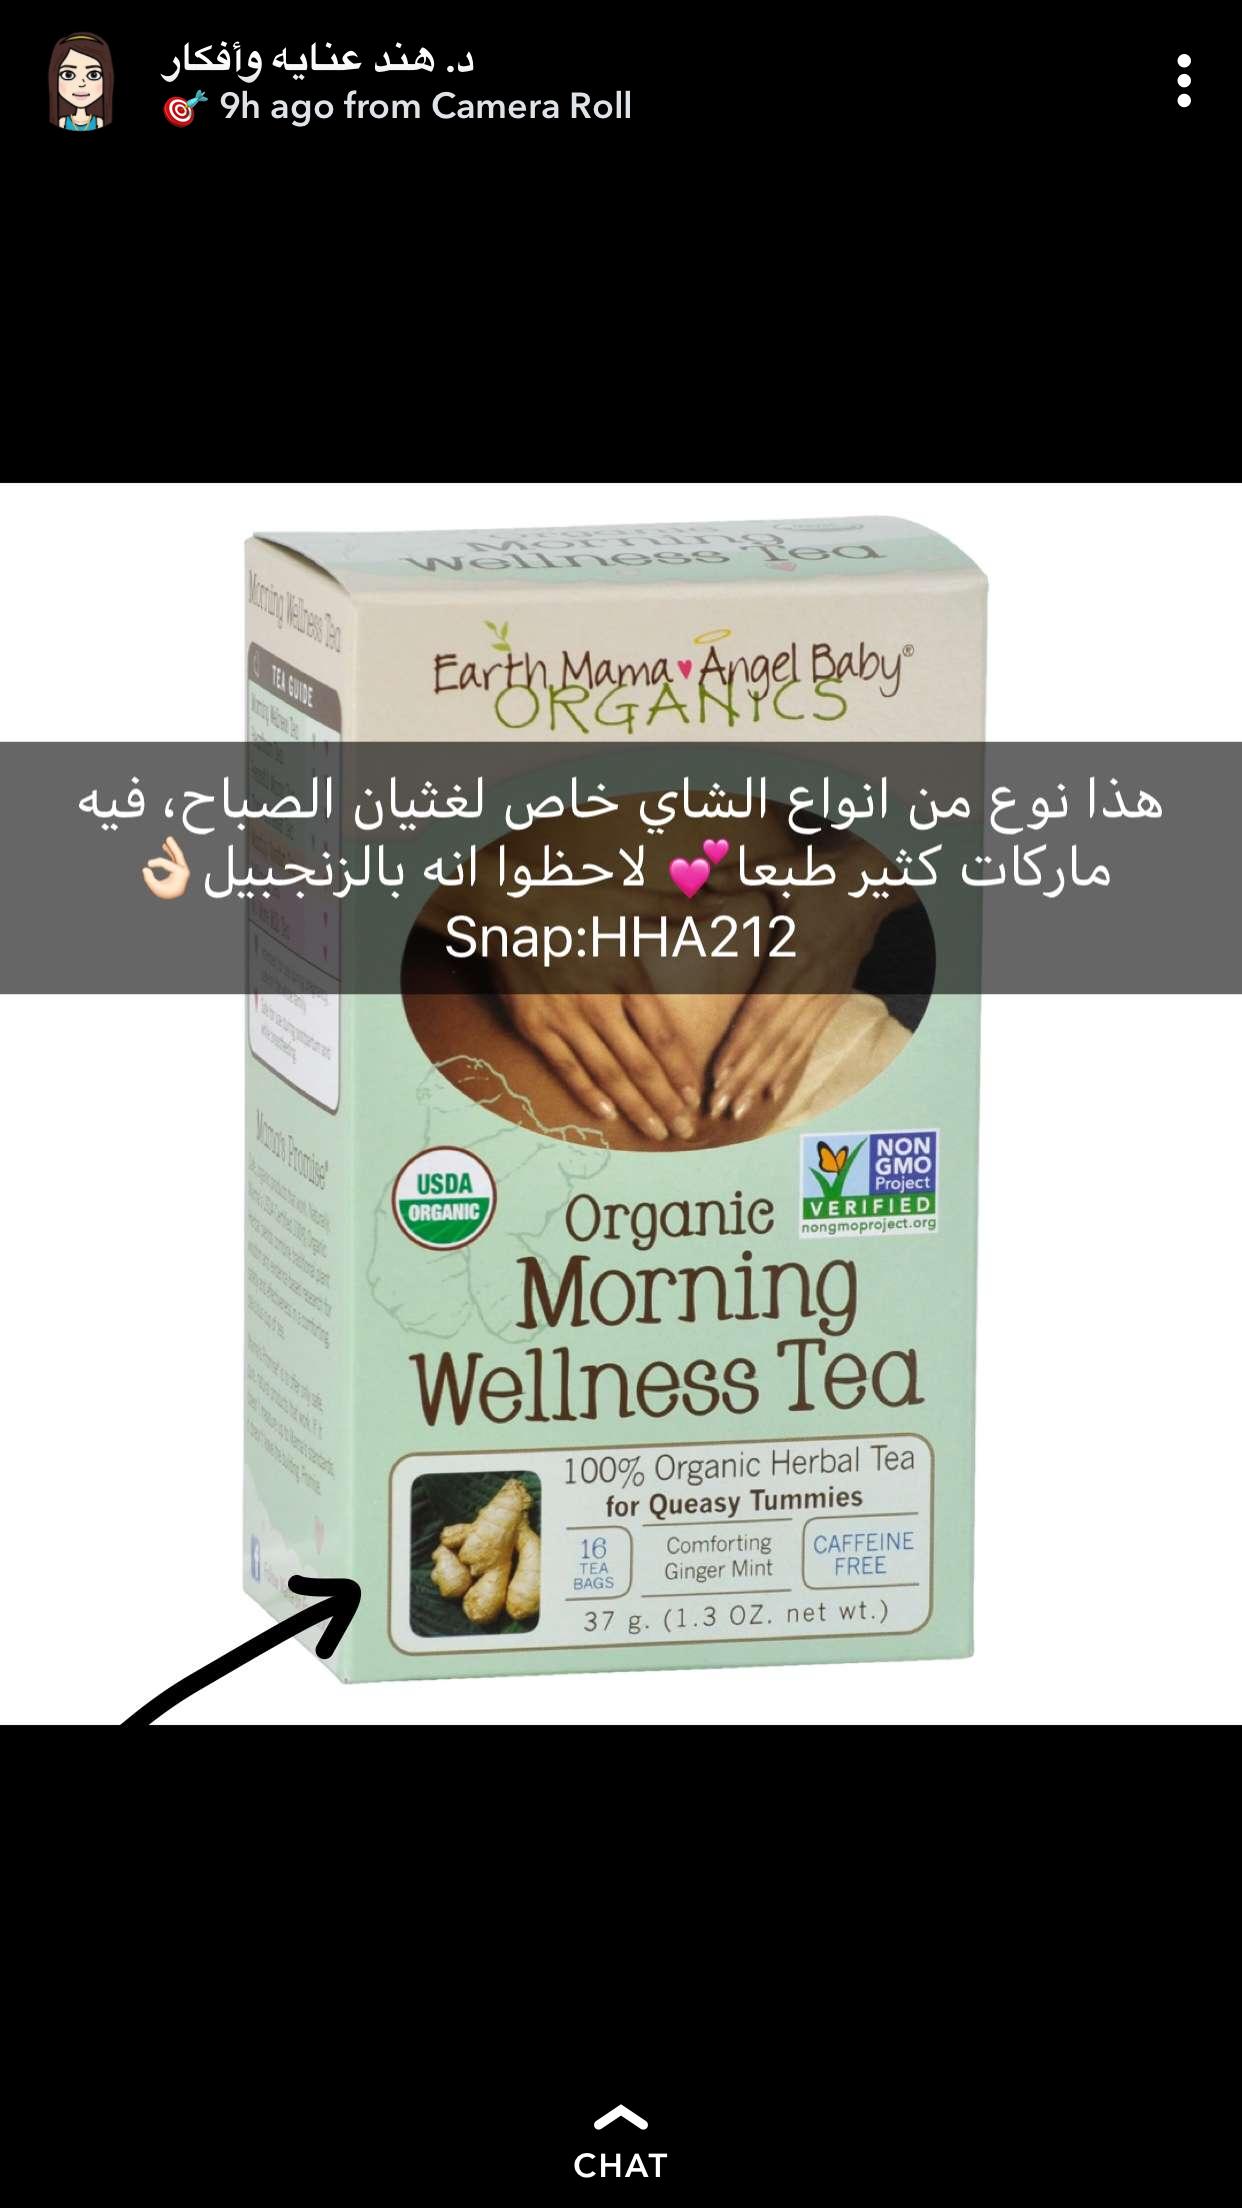 Pin By Hessa Ahmad On اتكيت بداية الحمل و العنايه بالحامل Organic Herbal Tea Herbalism Earth Mama Angel Baby